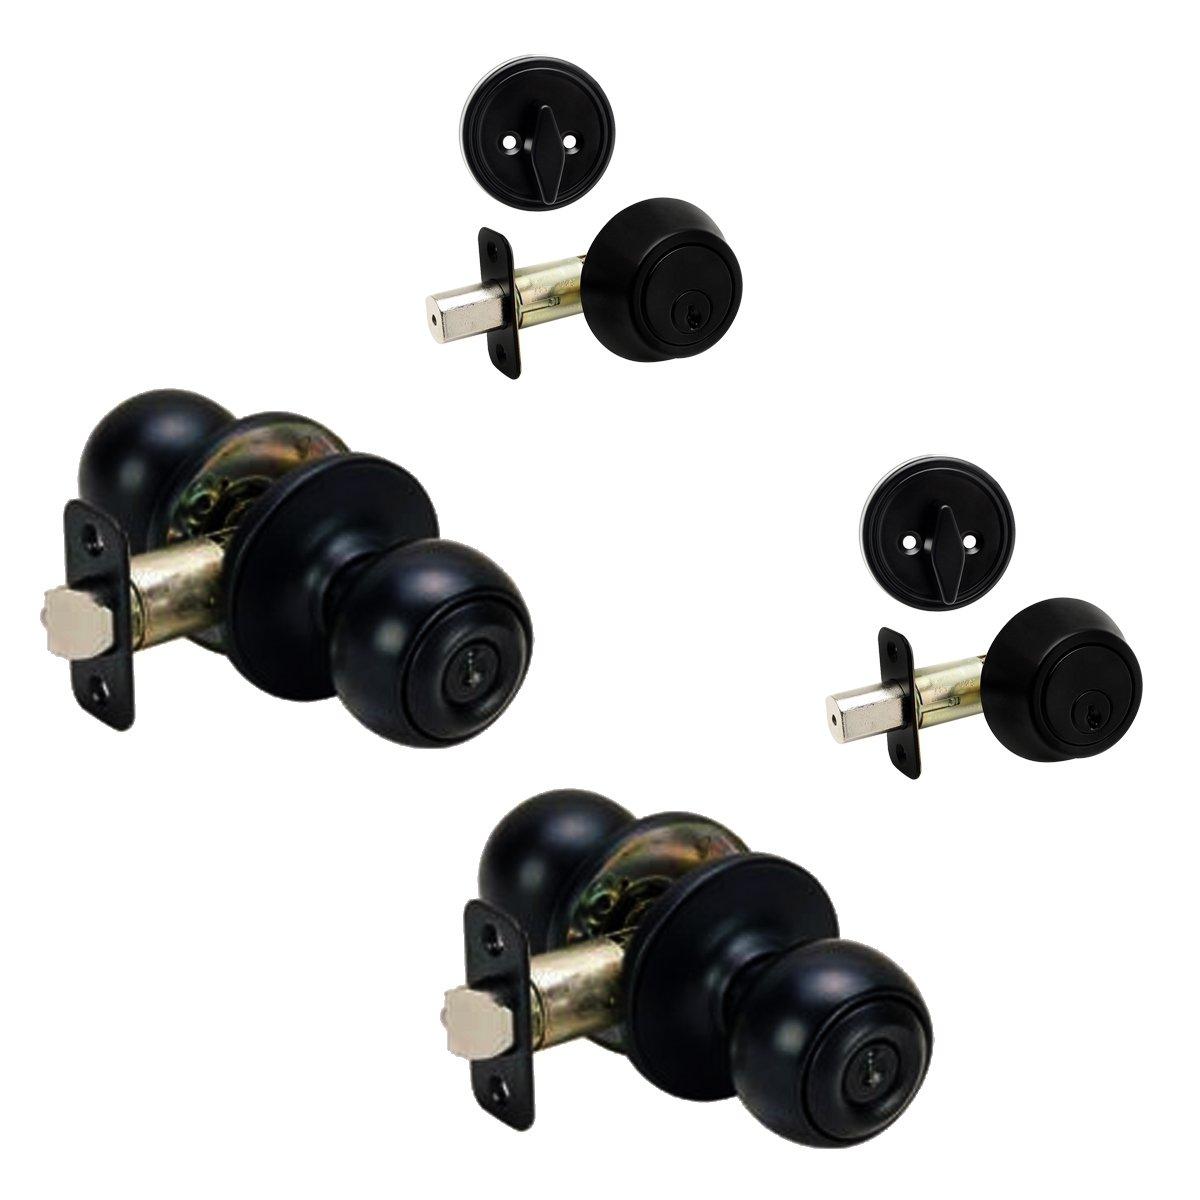 2 - Ashland Matte Black Entry Knob with Matching Single Cylinder Deadbolt Combo Packs Keyed Alike (We Key Lock Orders Alike for Free)